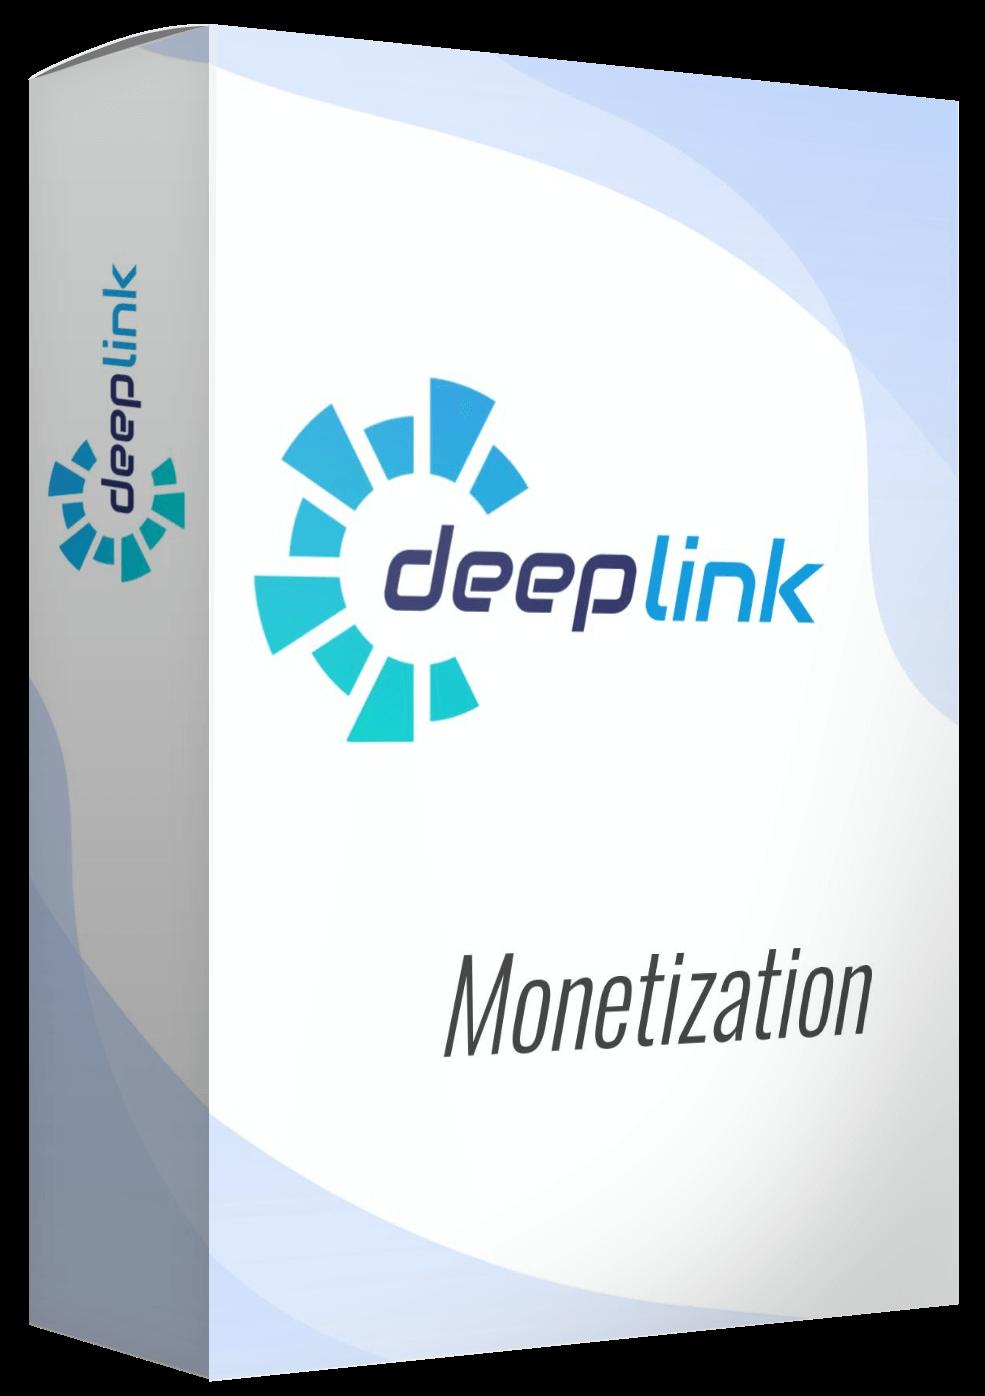 DeepLink-oto-3